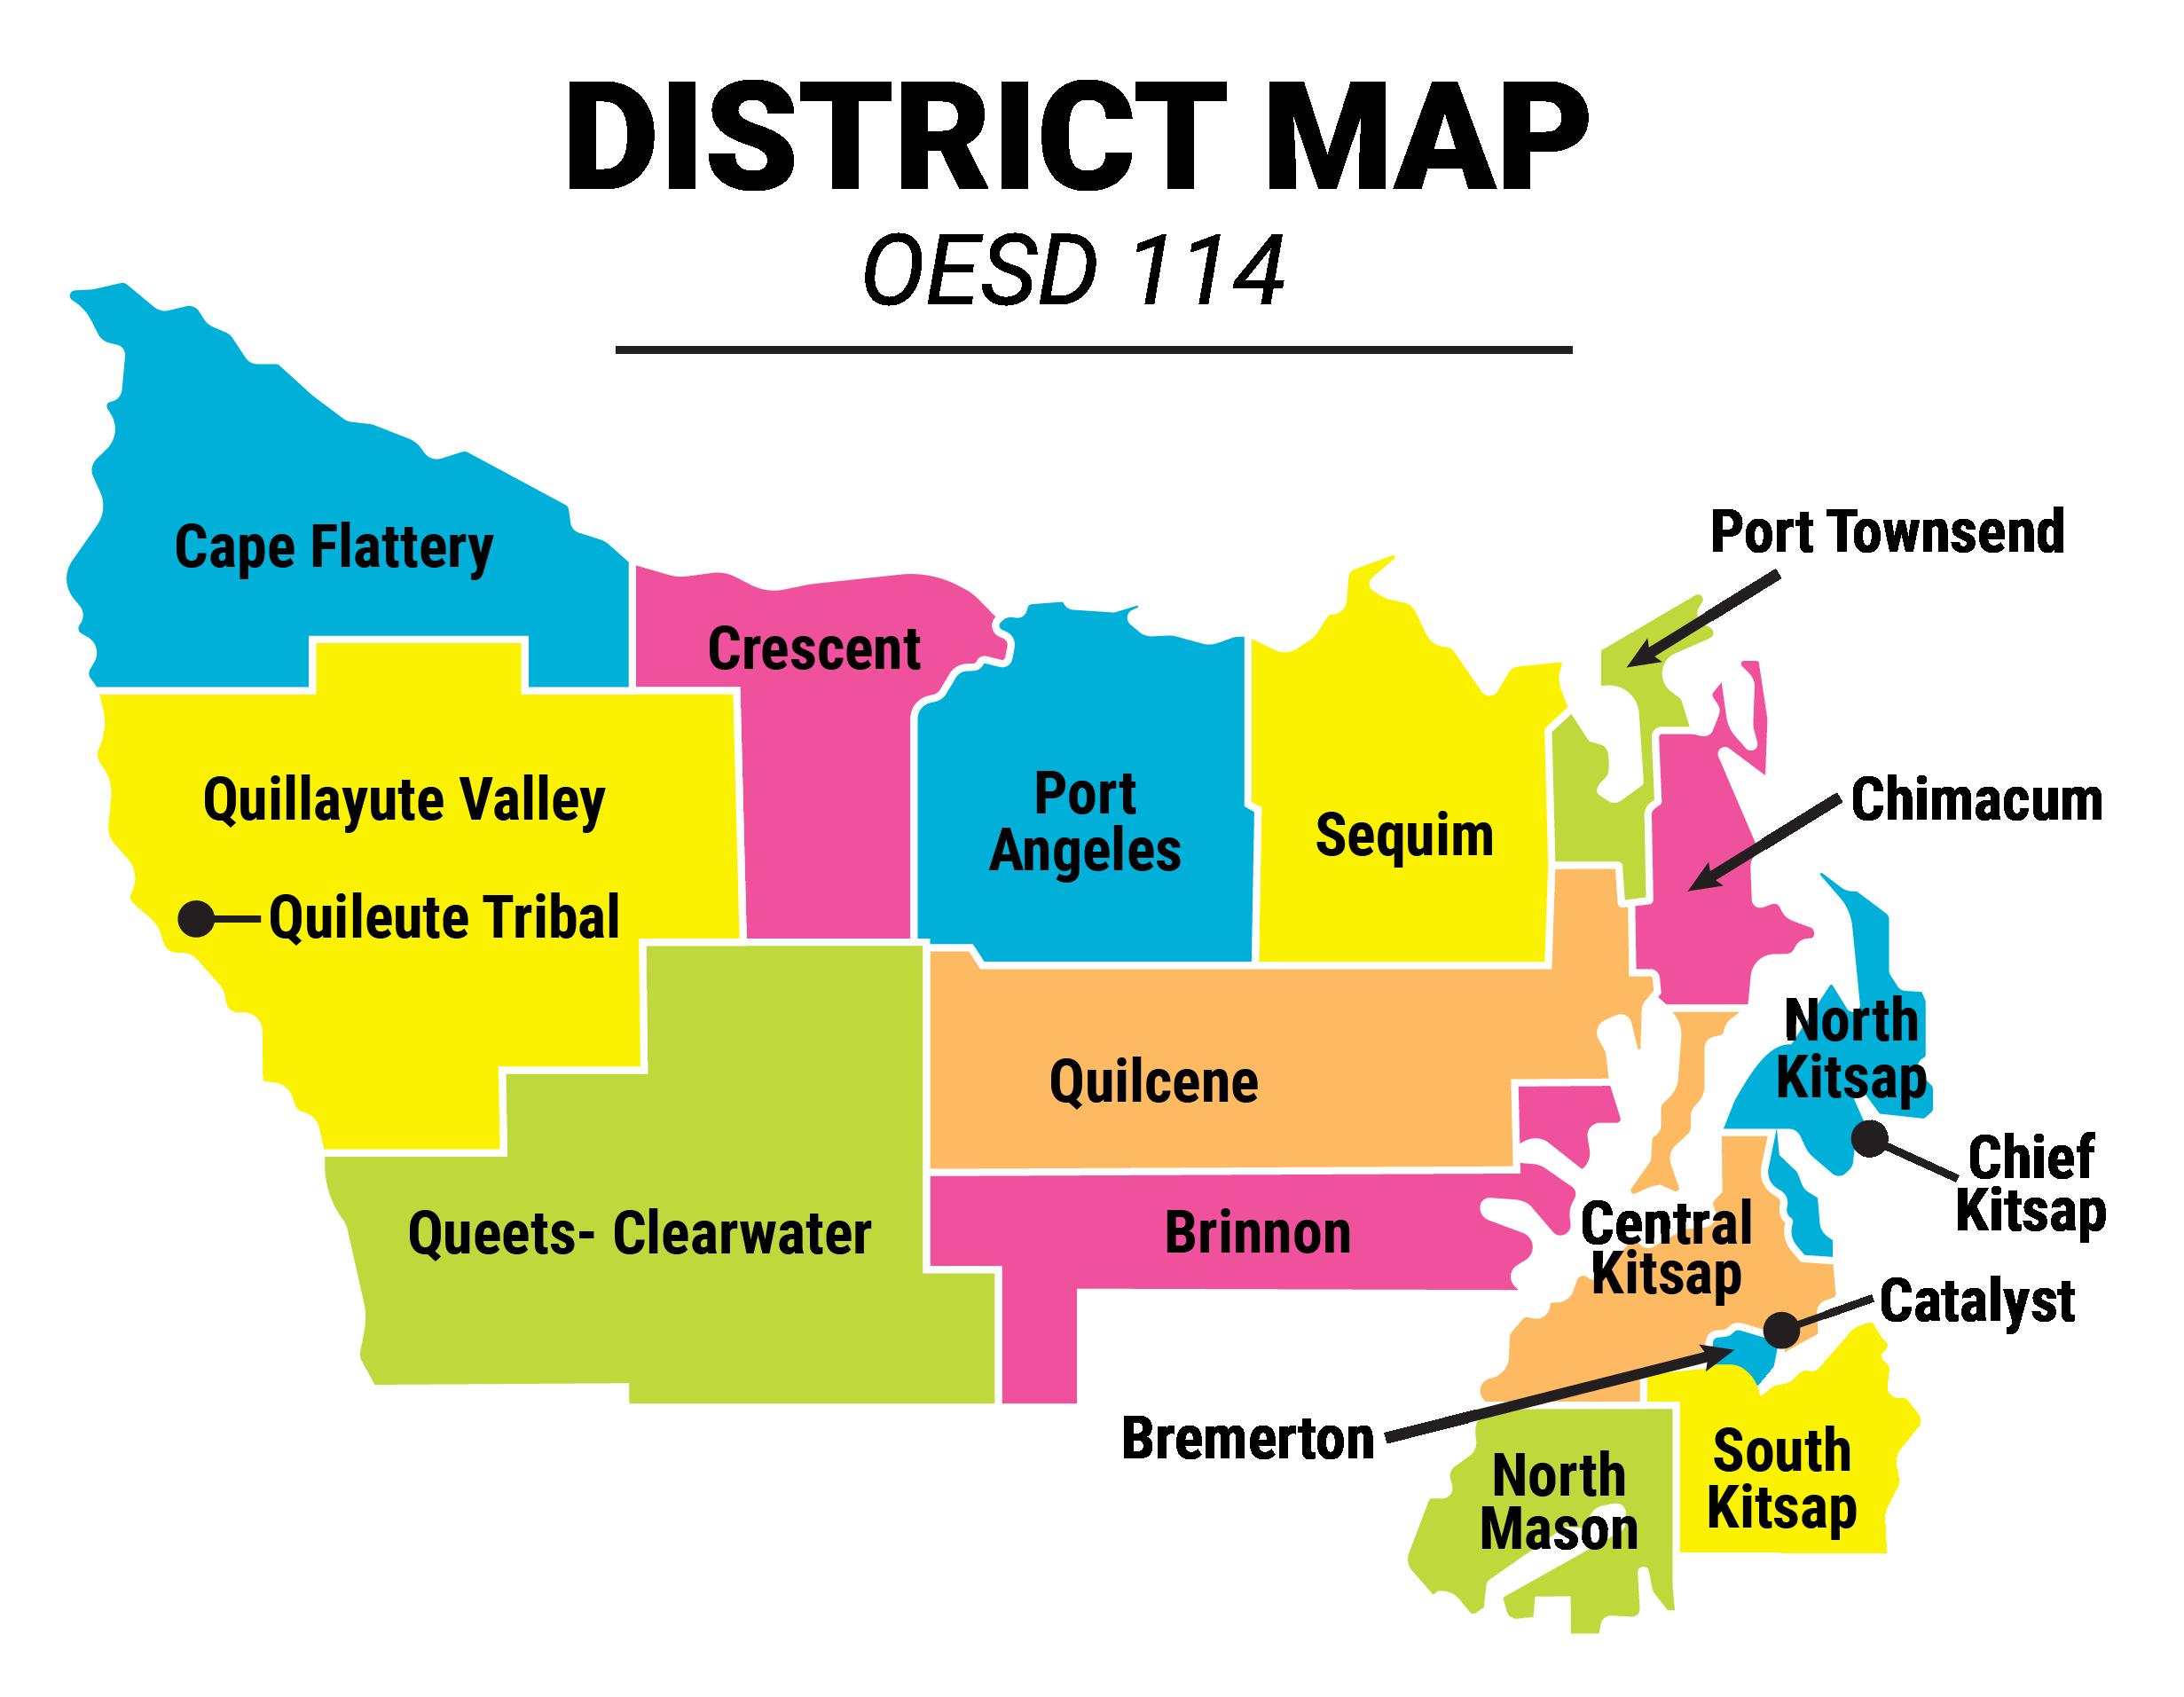 OESD 114 Map